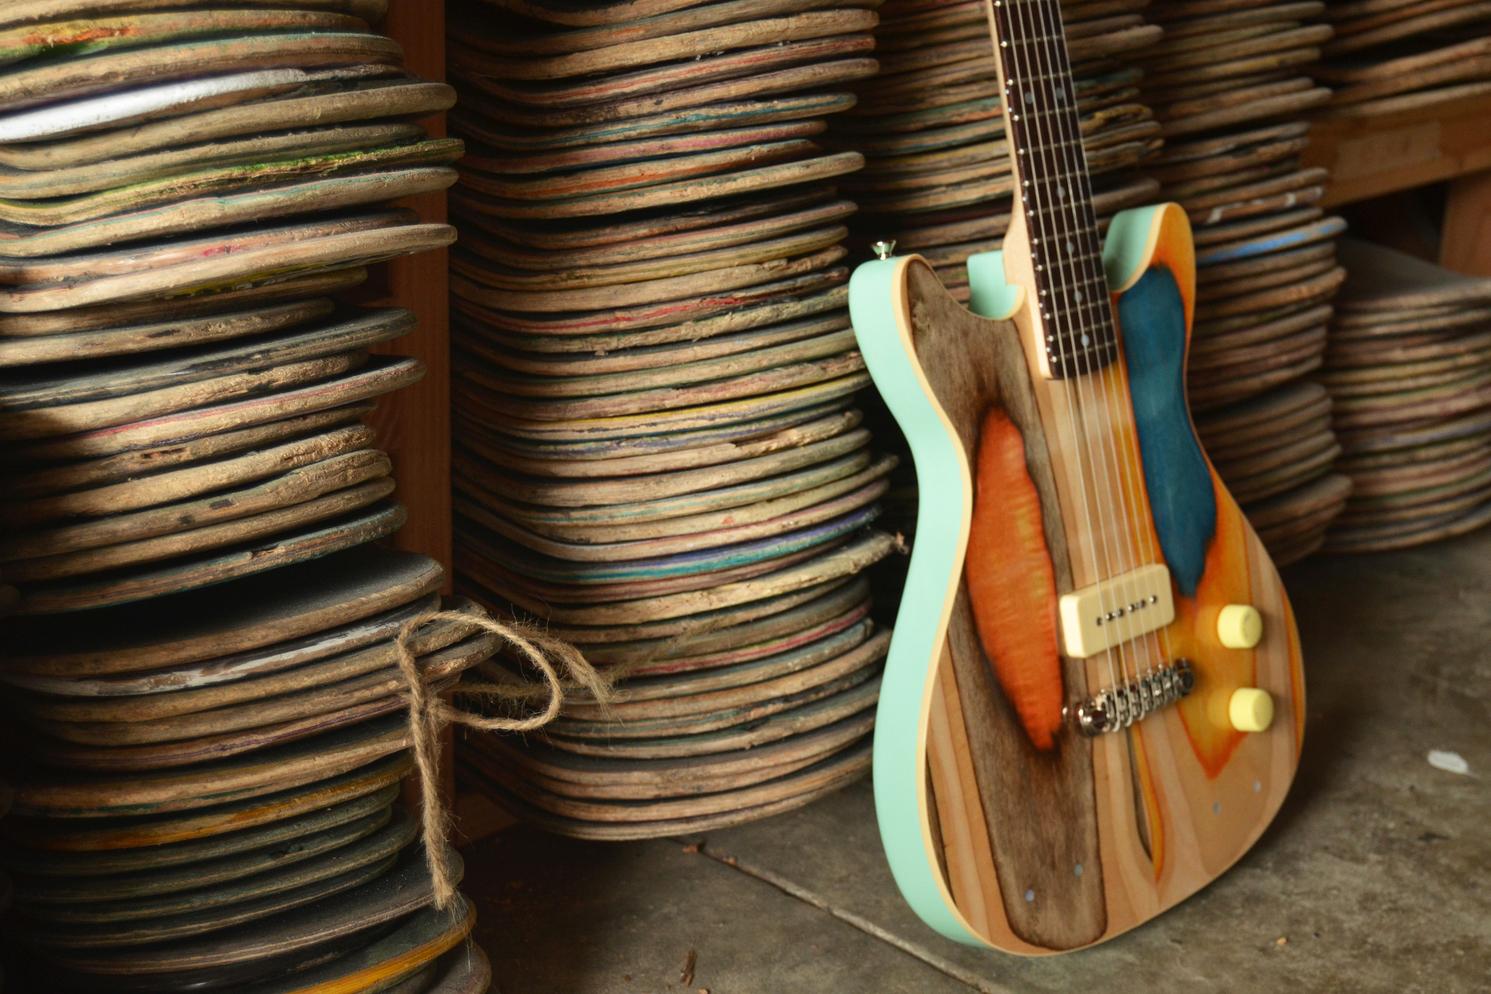 Designer Nick Pourfard Upcycles Skate Decks Into Colorful Guitars